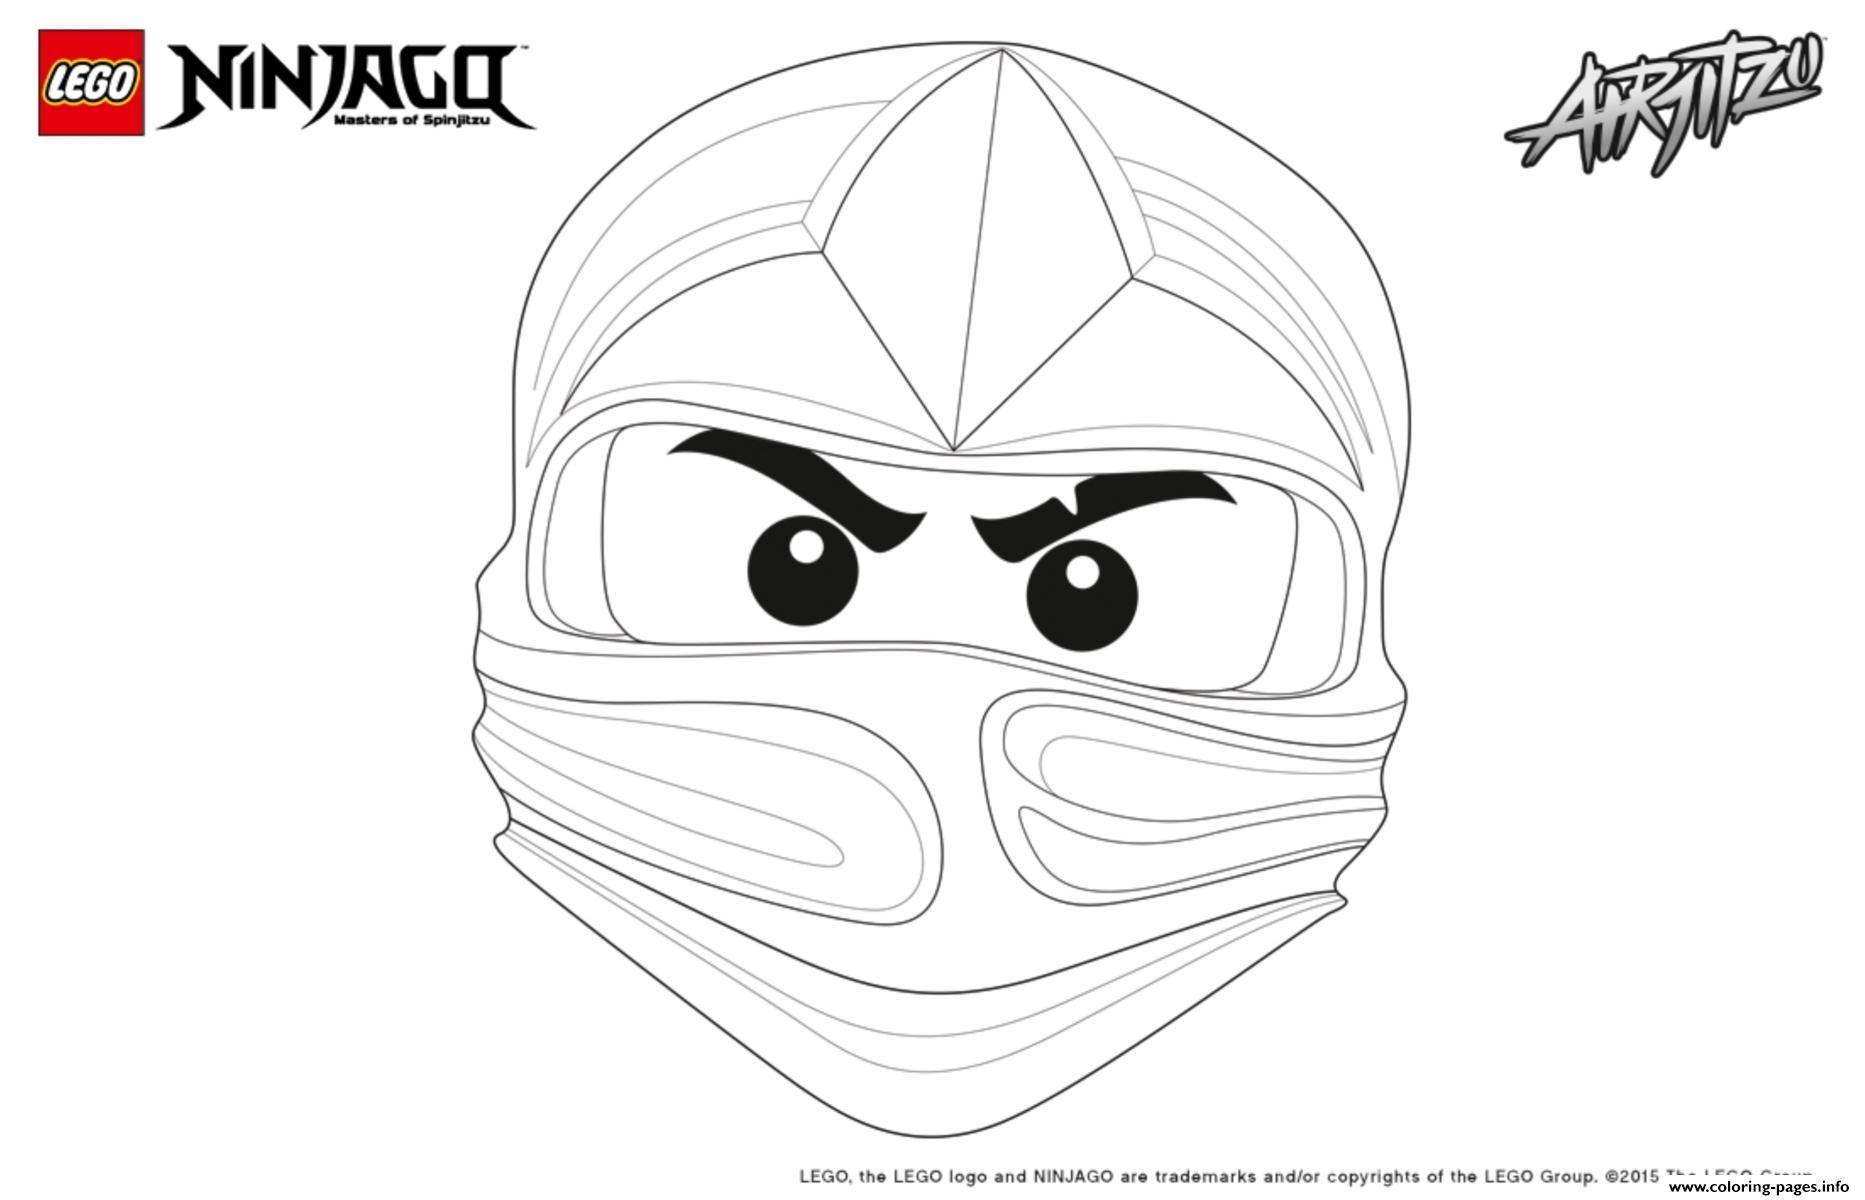 Print Ninjago Lego Kai Coloring Pages Ausmalbilder Wenn Du Mal Buch Ausmalen